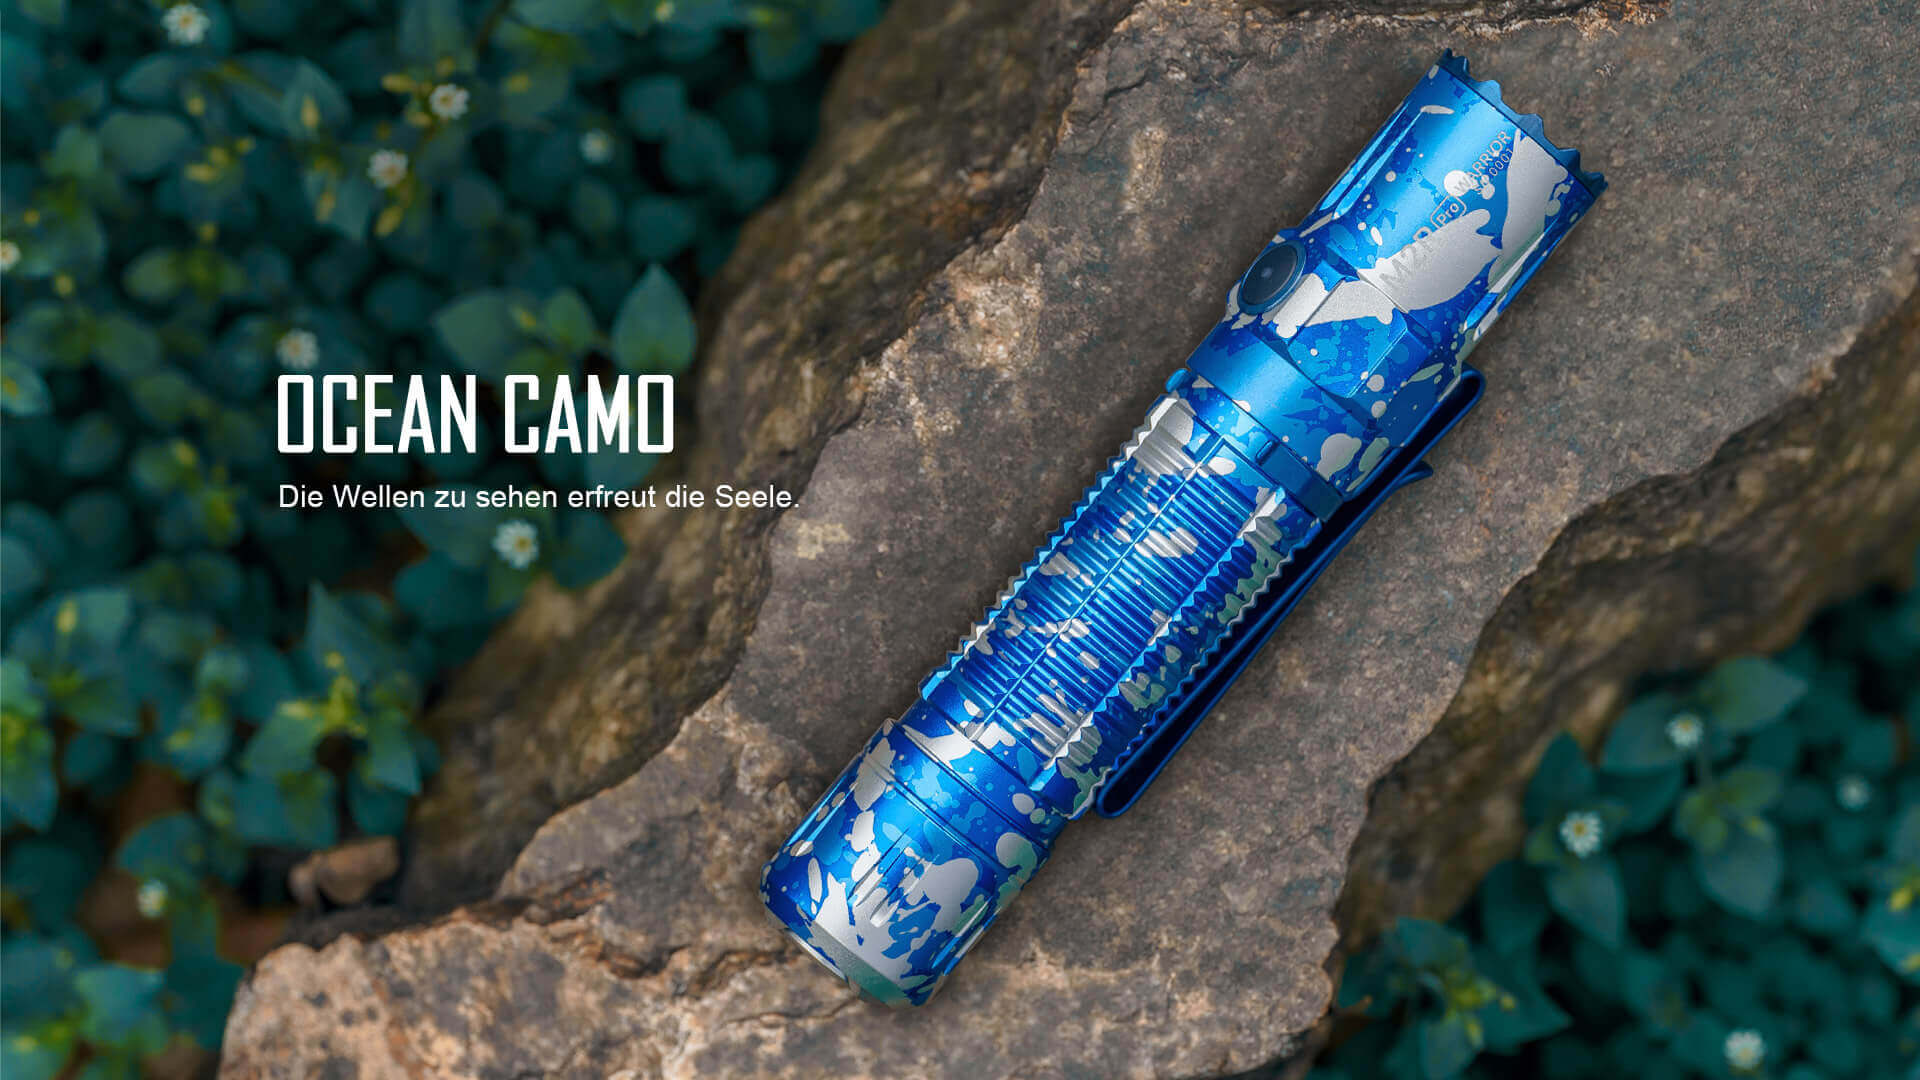 Olight M2R Pro Taschenlampe aus Aluminiumlegierung